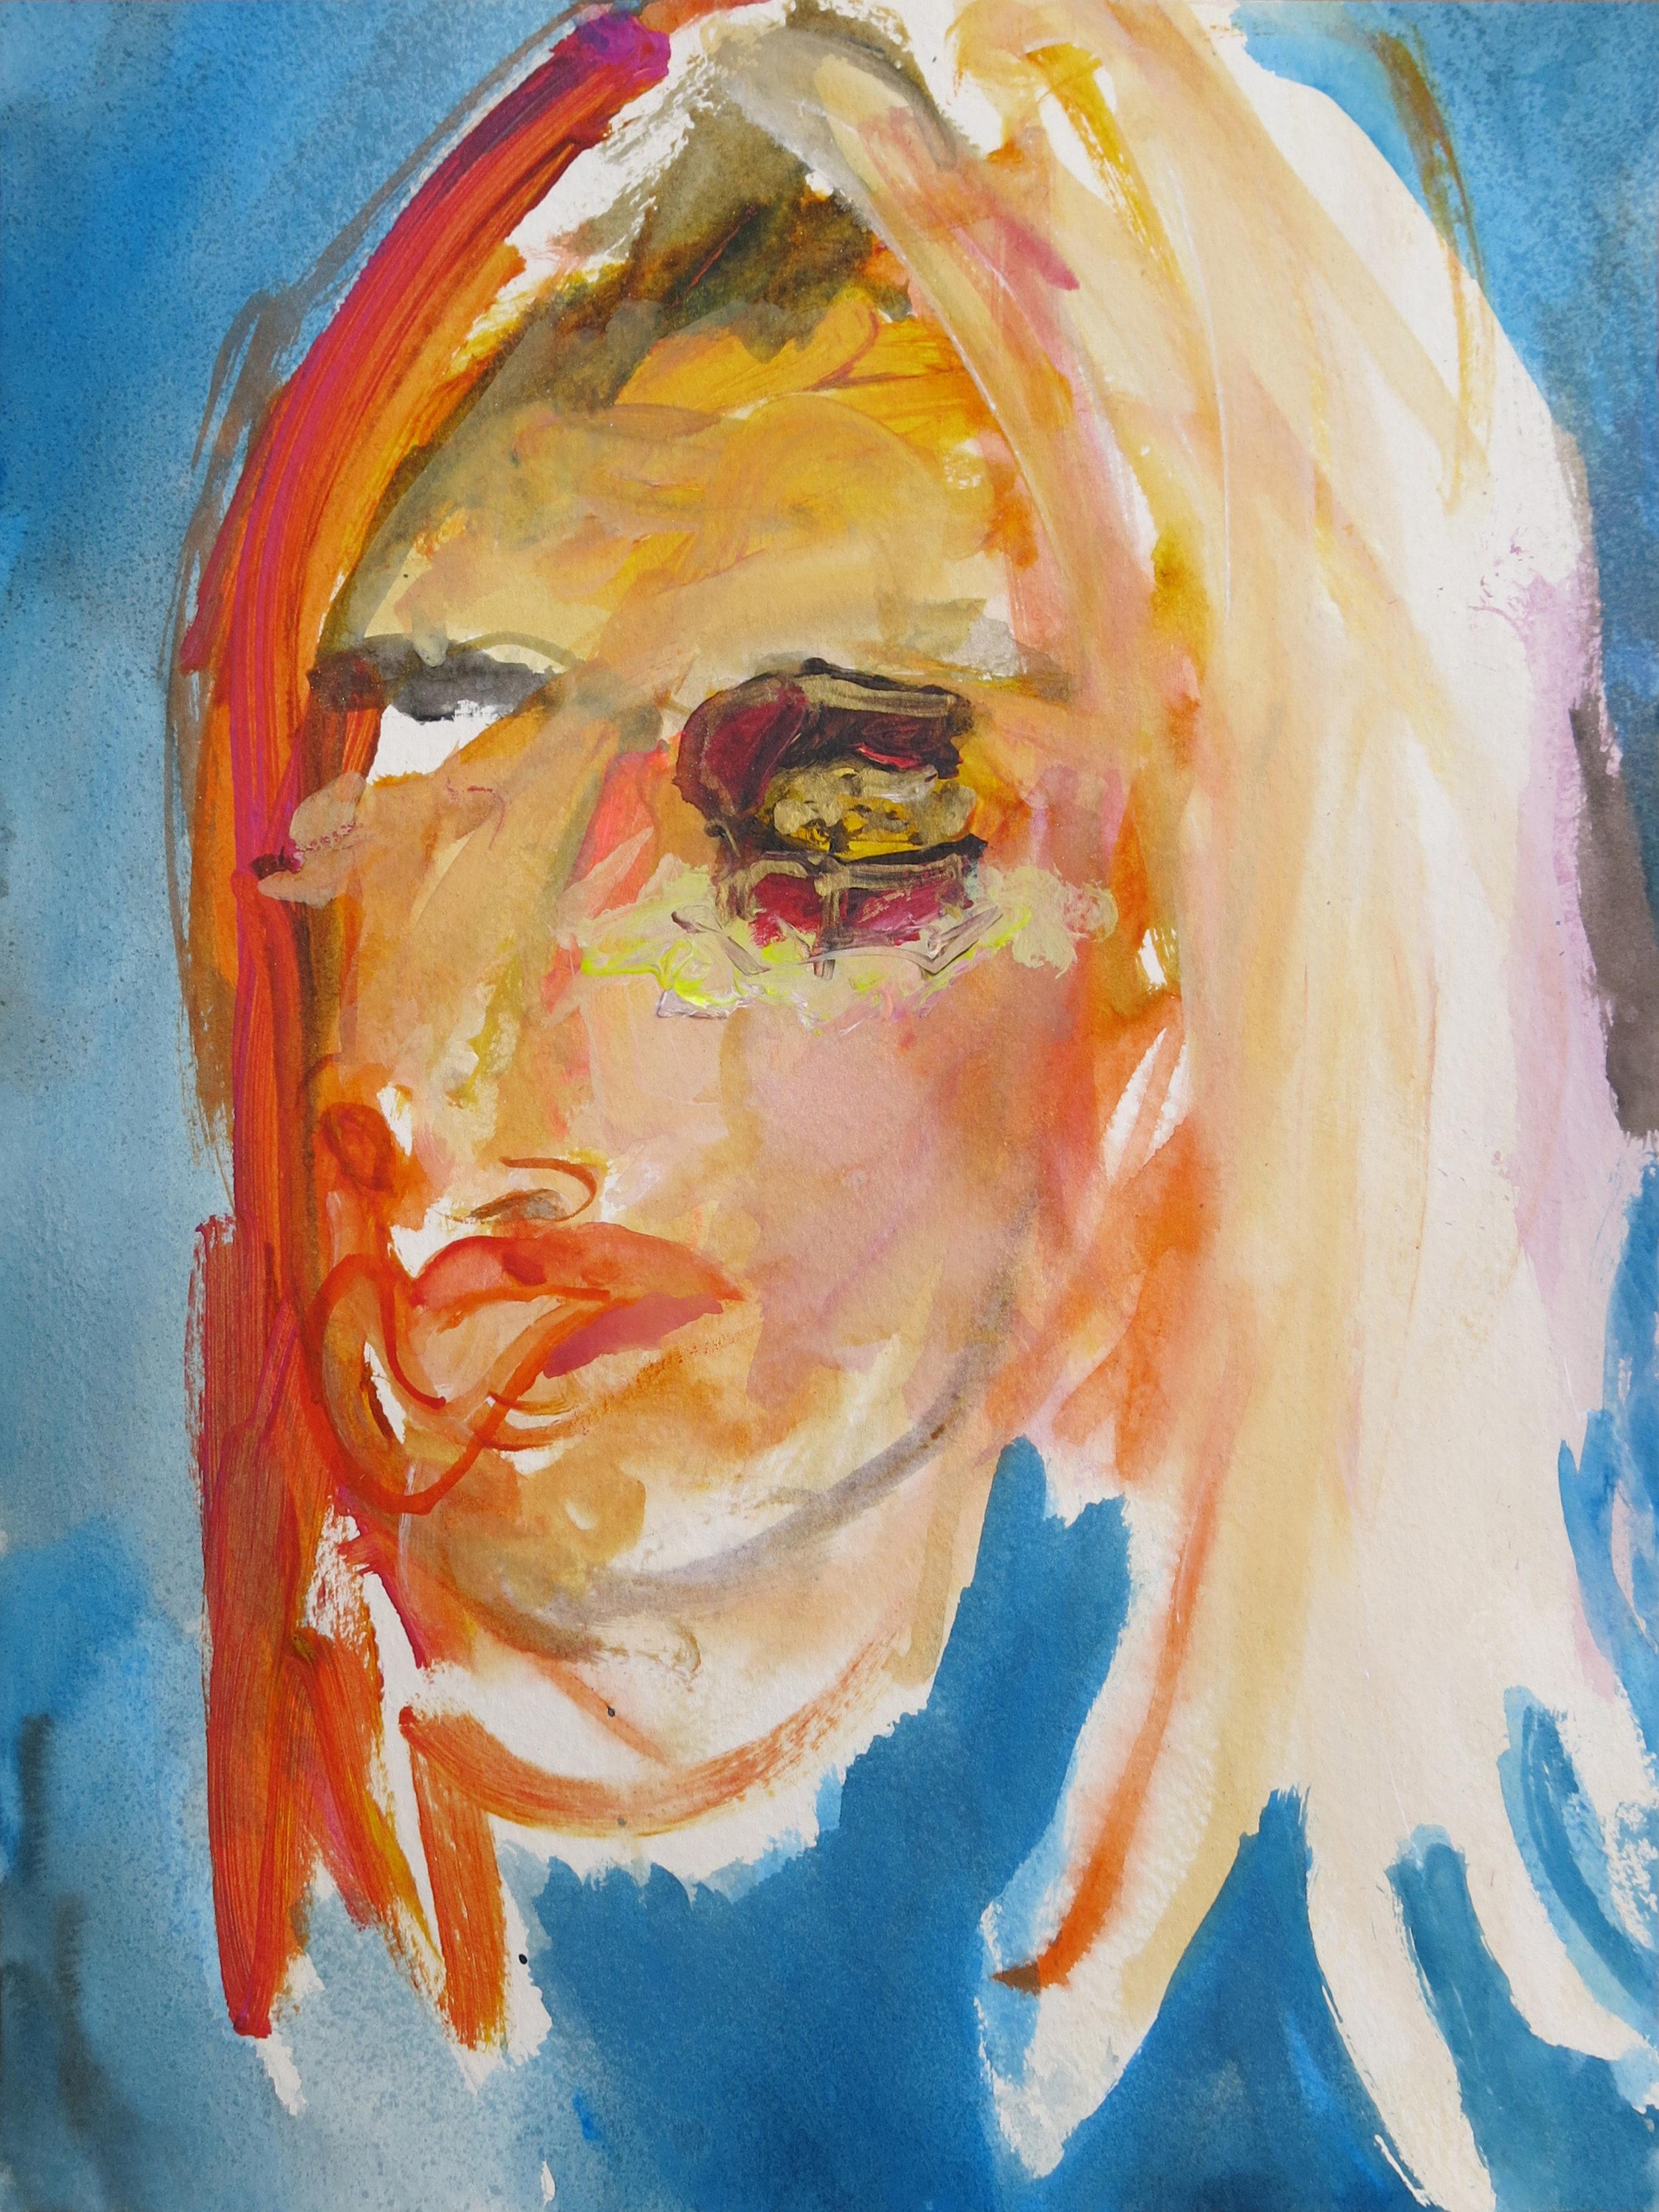 Barbra Streisand Portrait #214